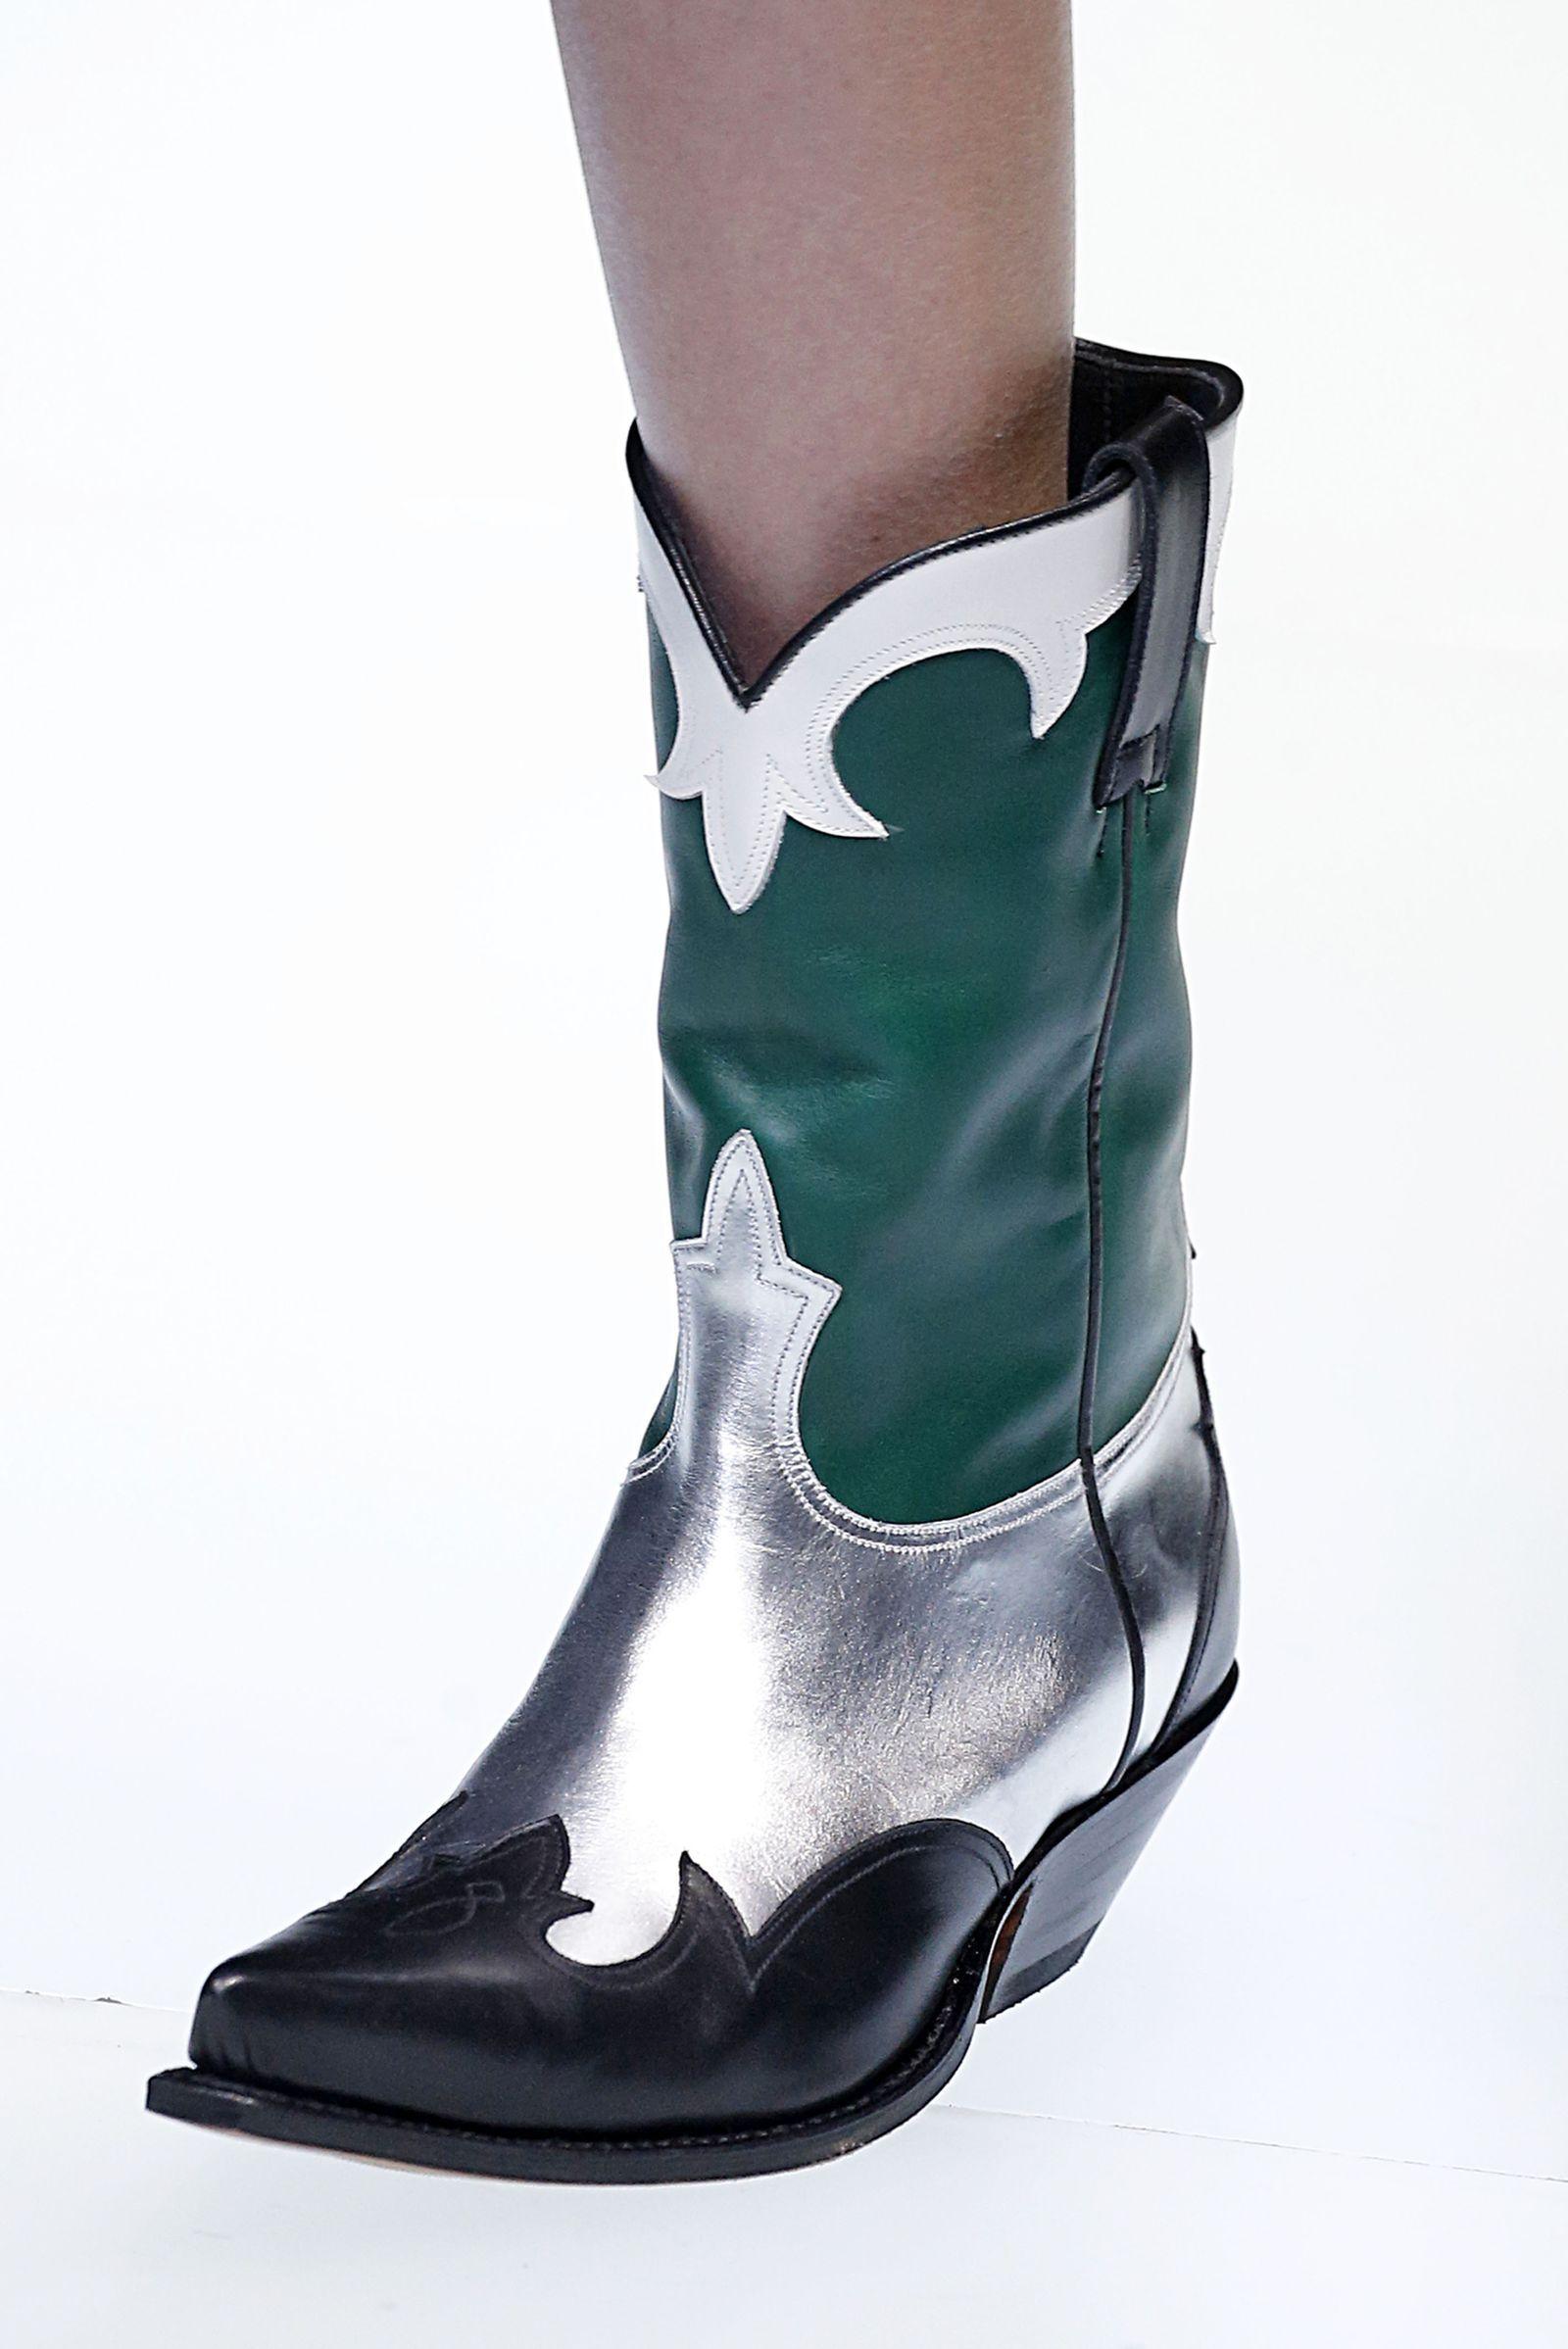 Shoes From Milan Fashion Week Fall